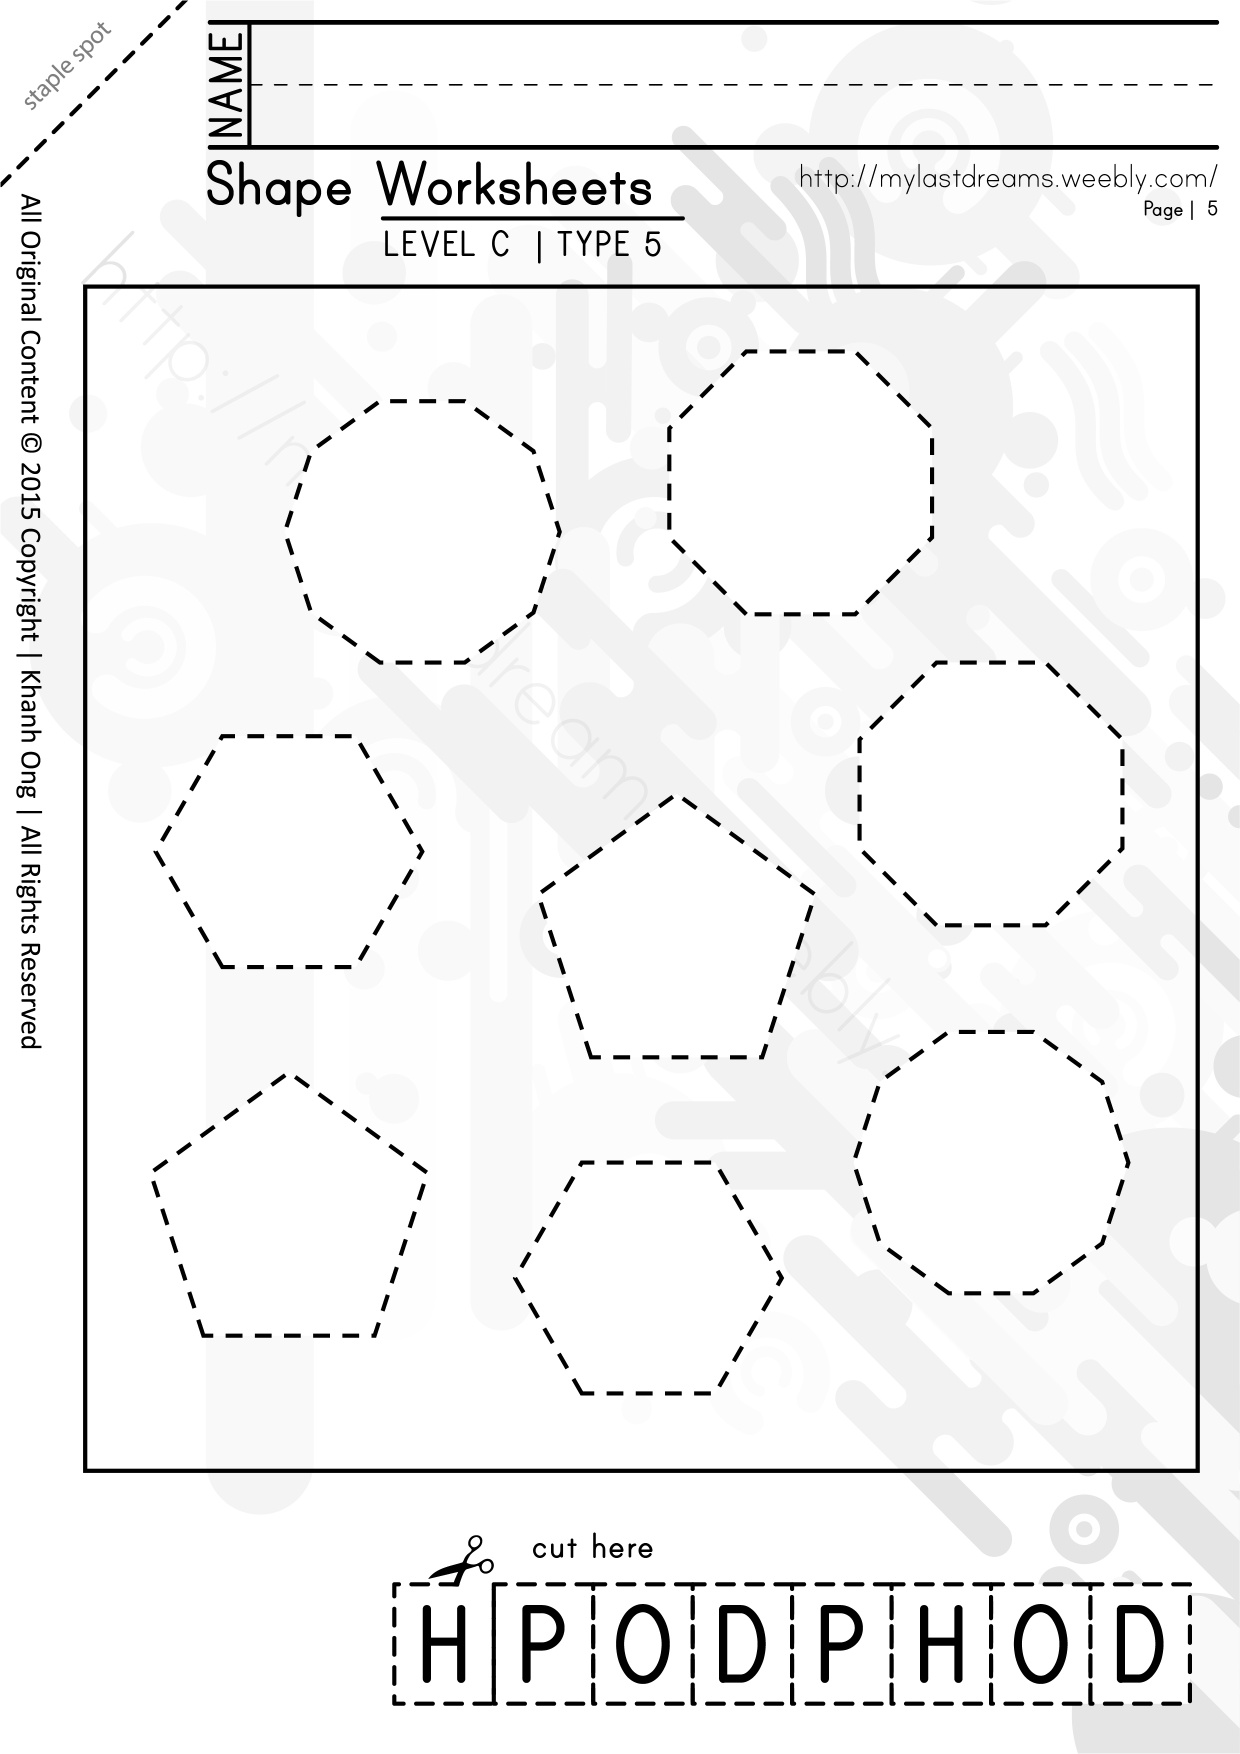 MLD - Basic Shapes Worksheets - Part 3 - A4 Sized